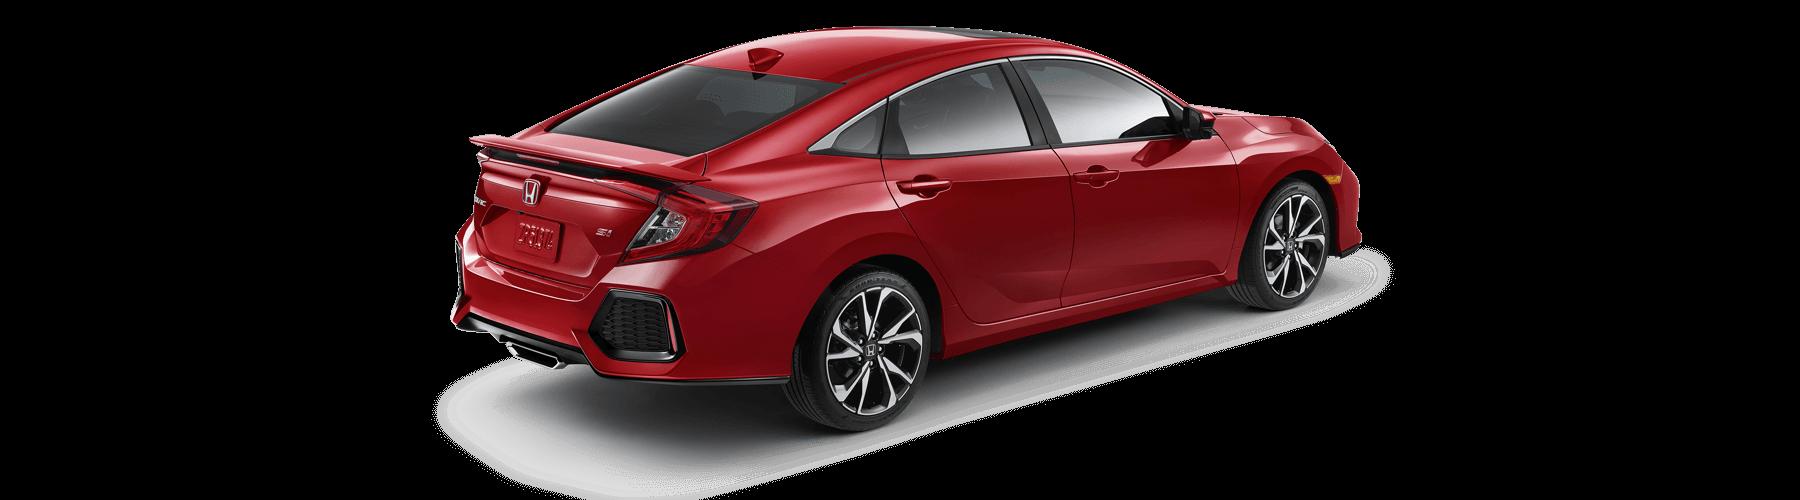 2018 Honda Civic Si Sedan Rear Angle